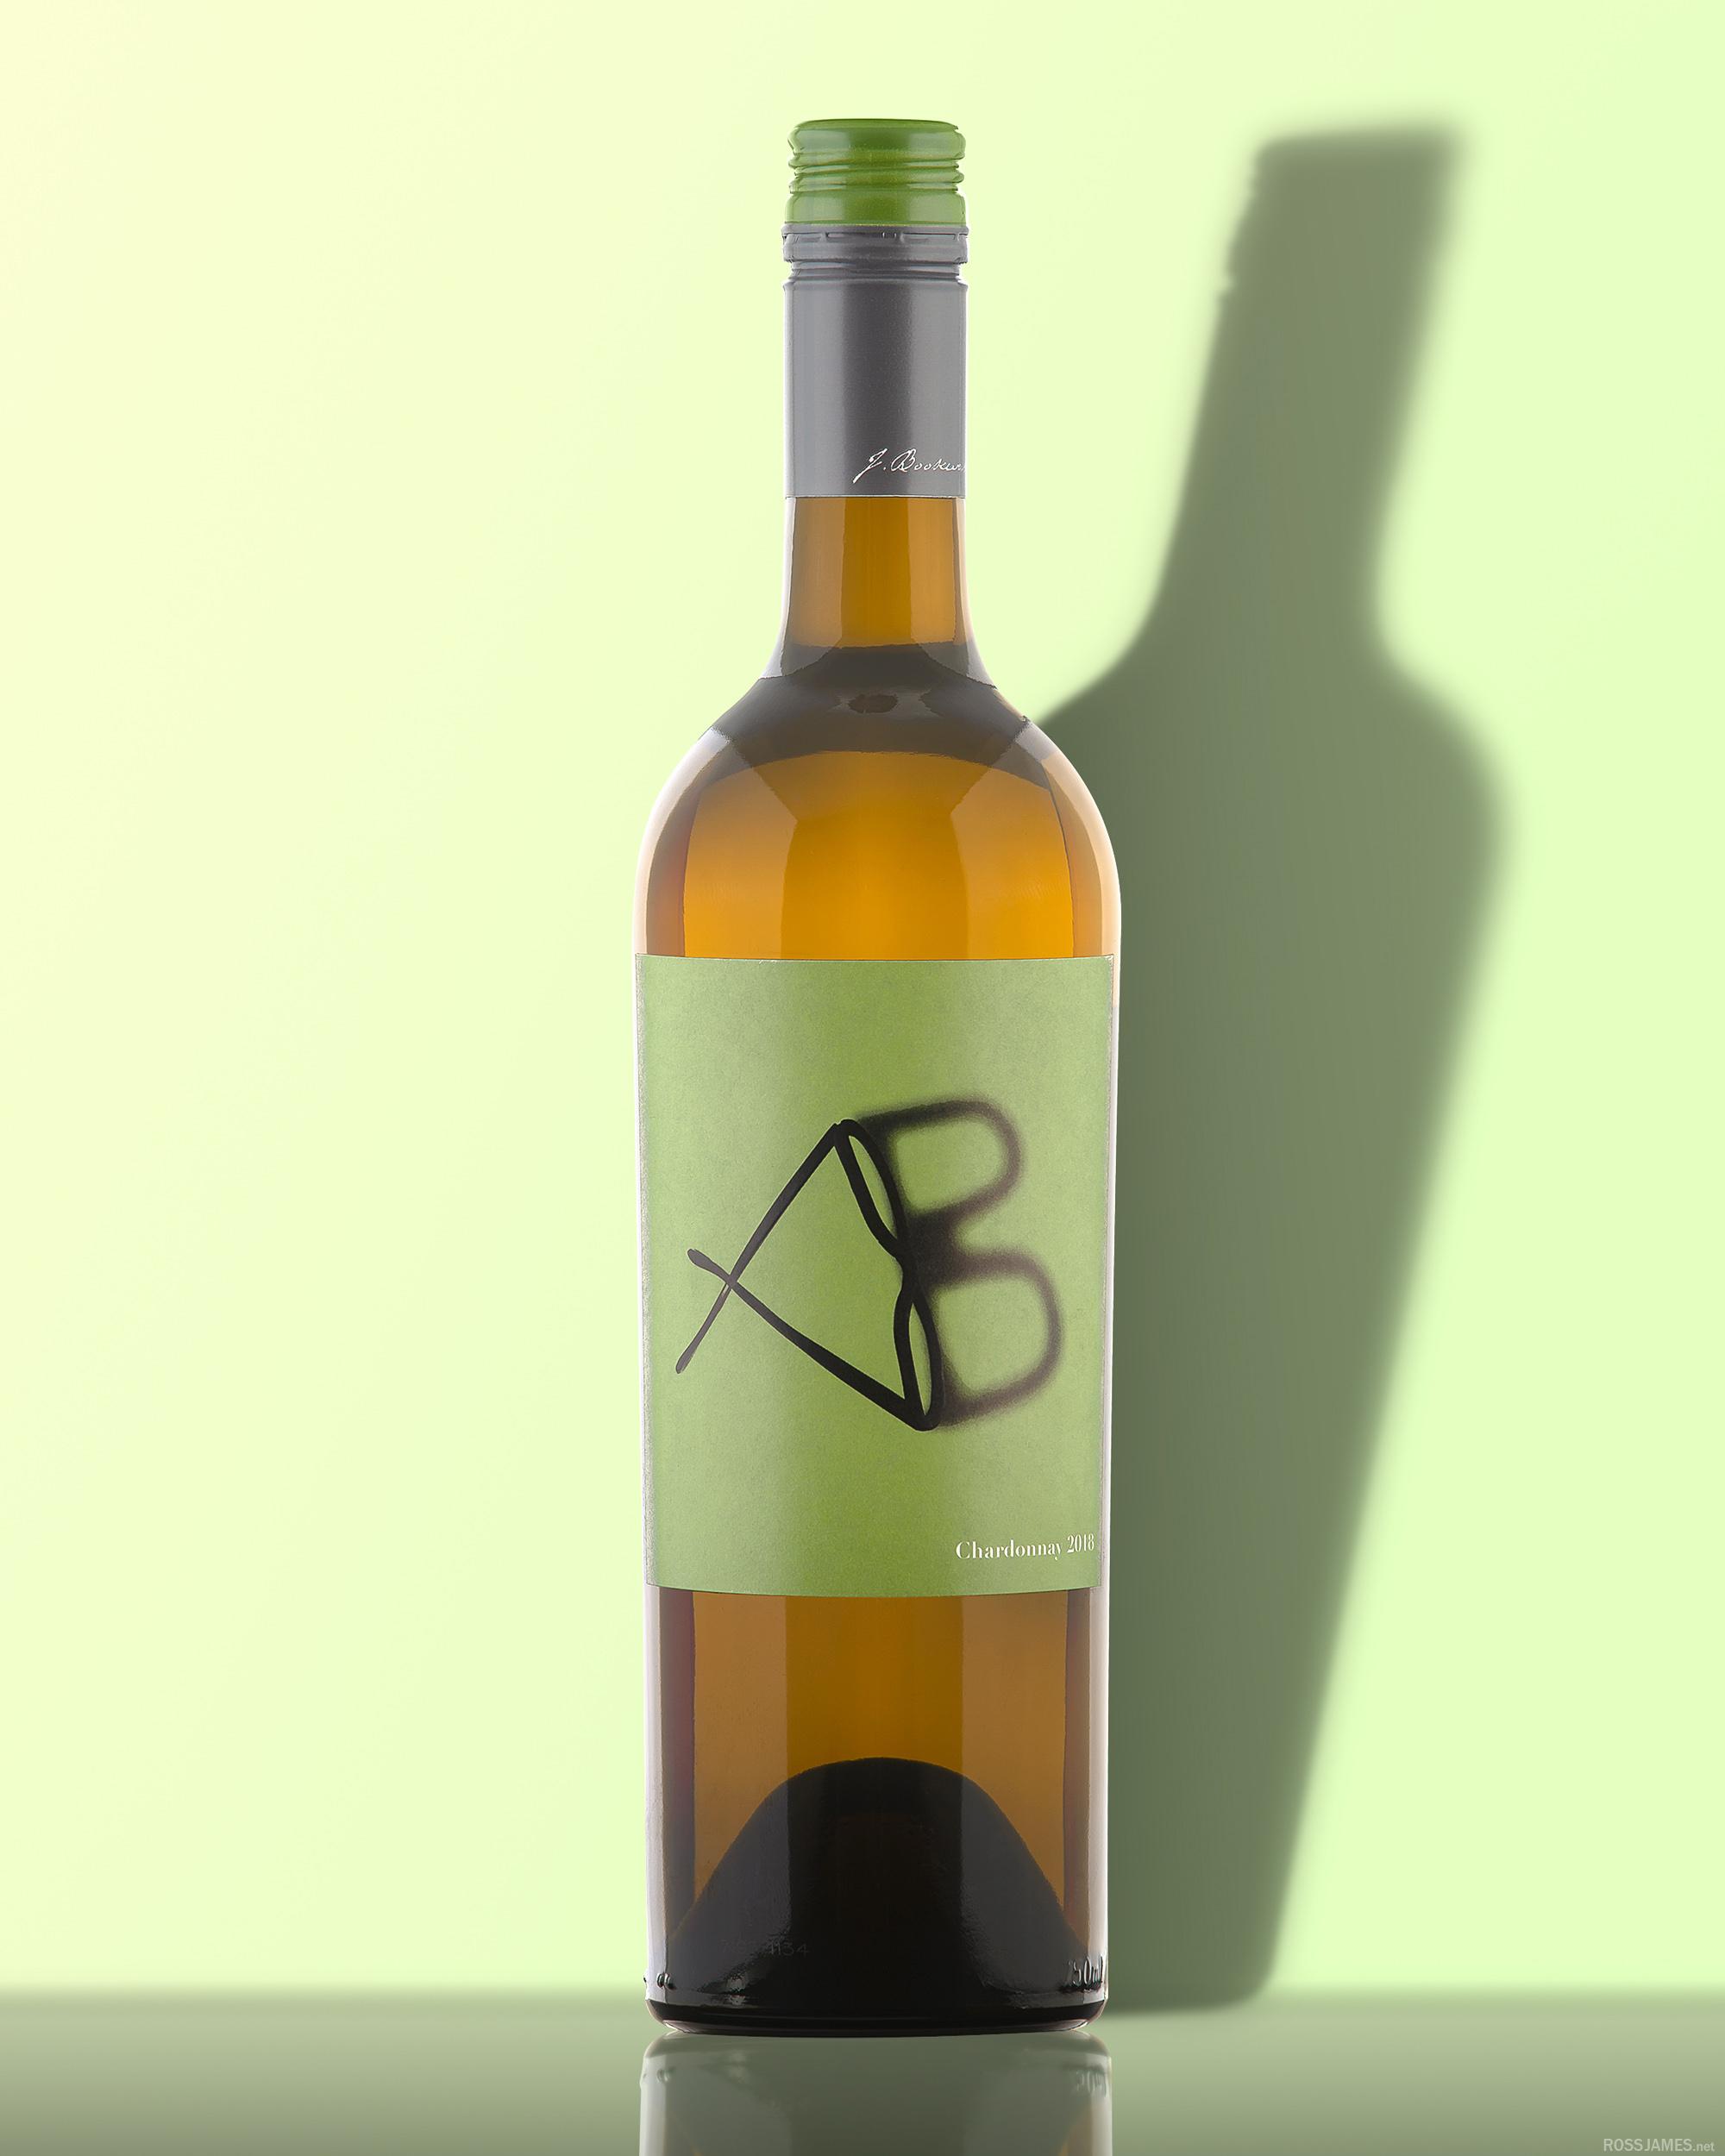 Bookwalter Chardonnay 2016 profile 8bit V3 2k.jpg